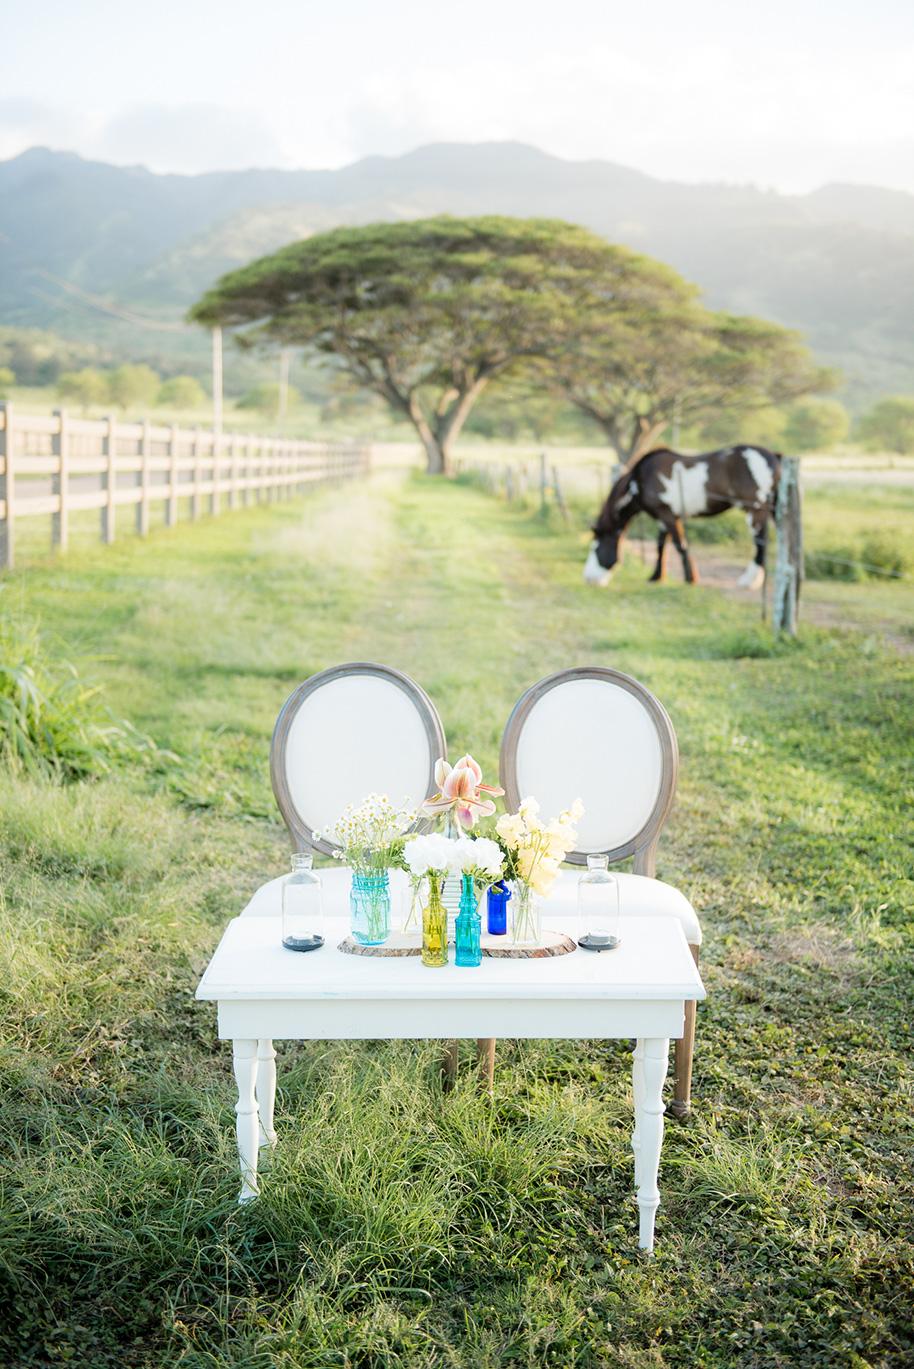 Dillingham-Ranch-Wedding-032316-37